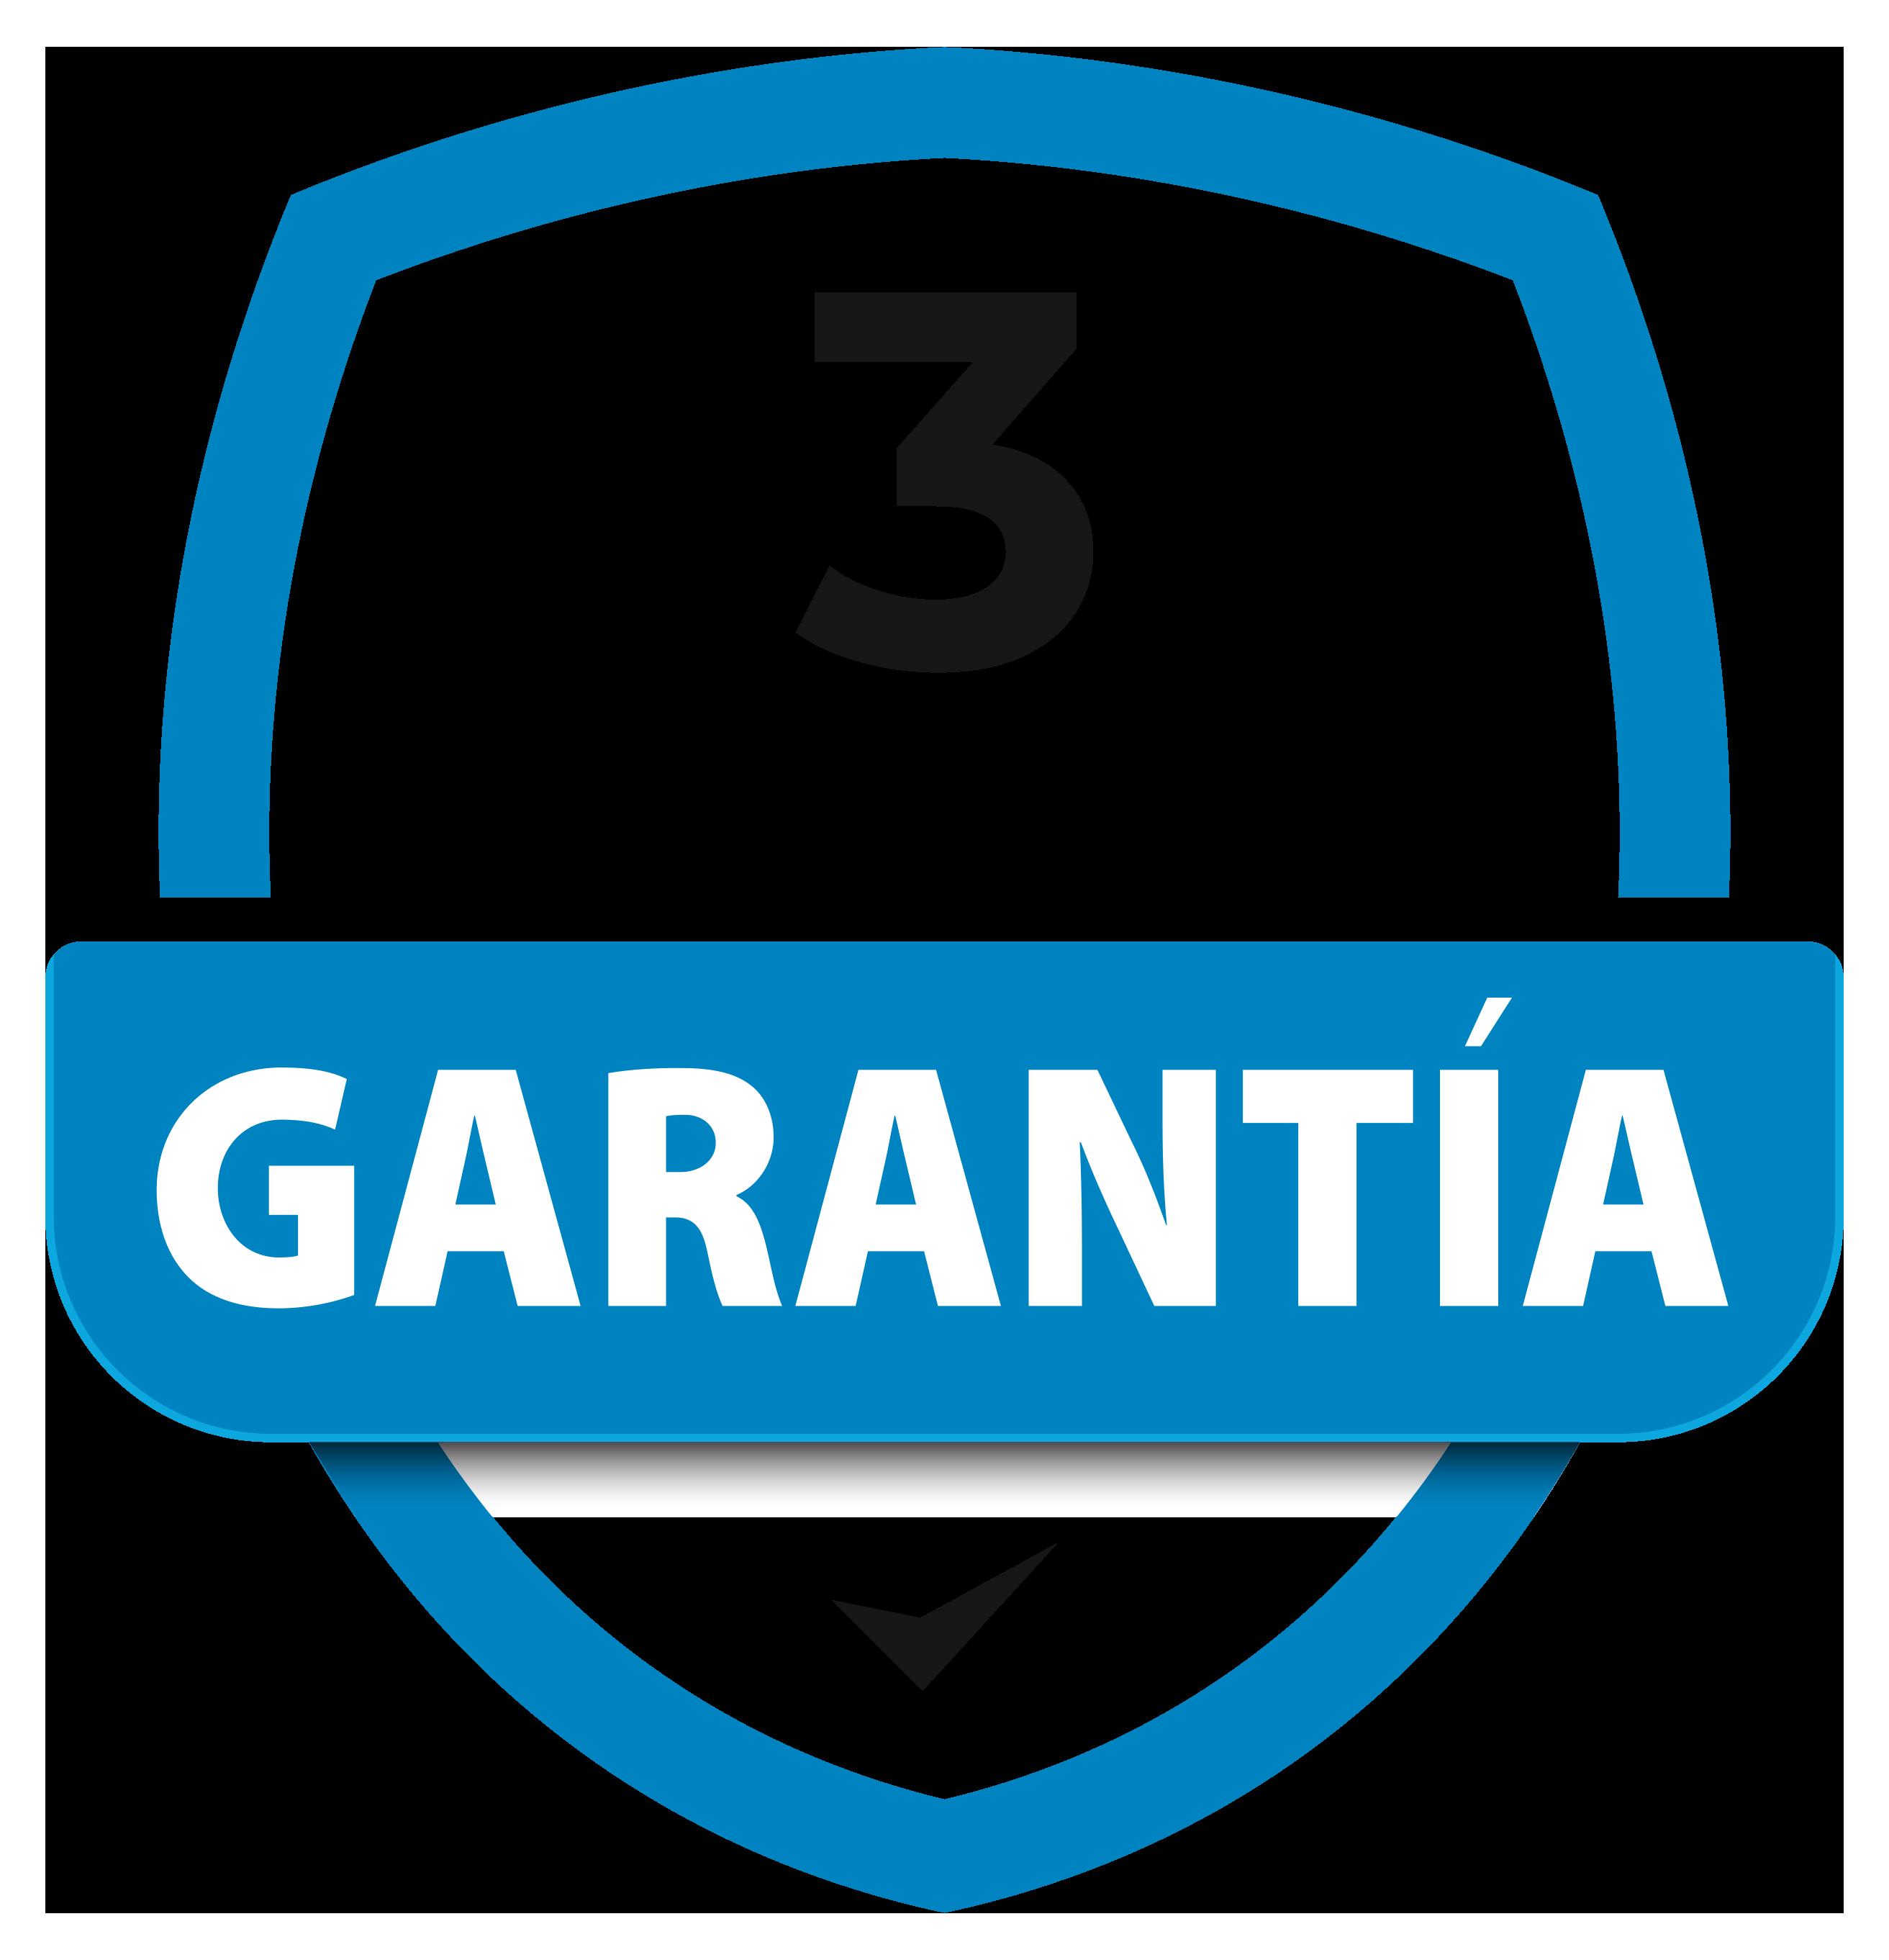 Garantia_alker